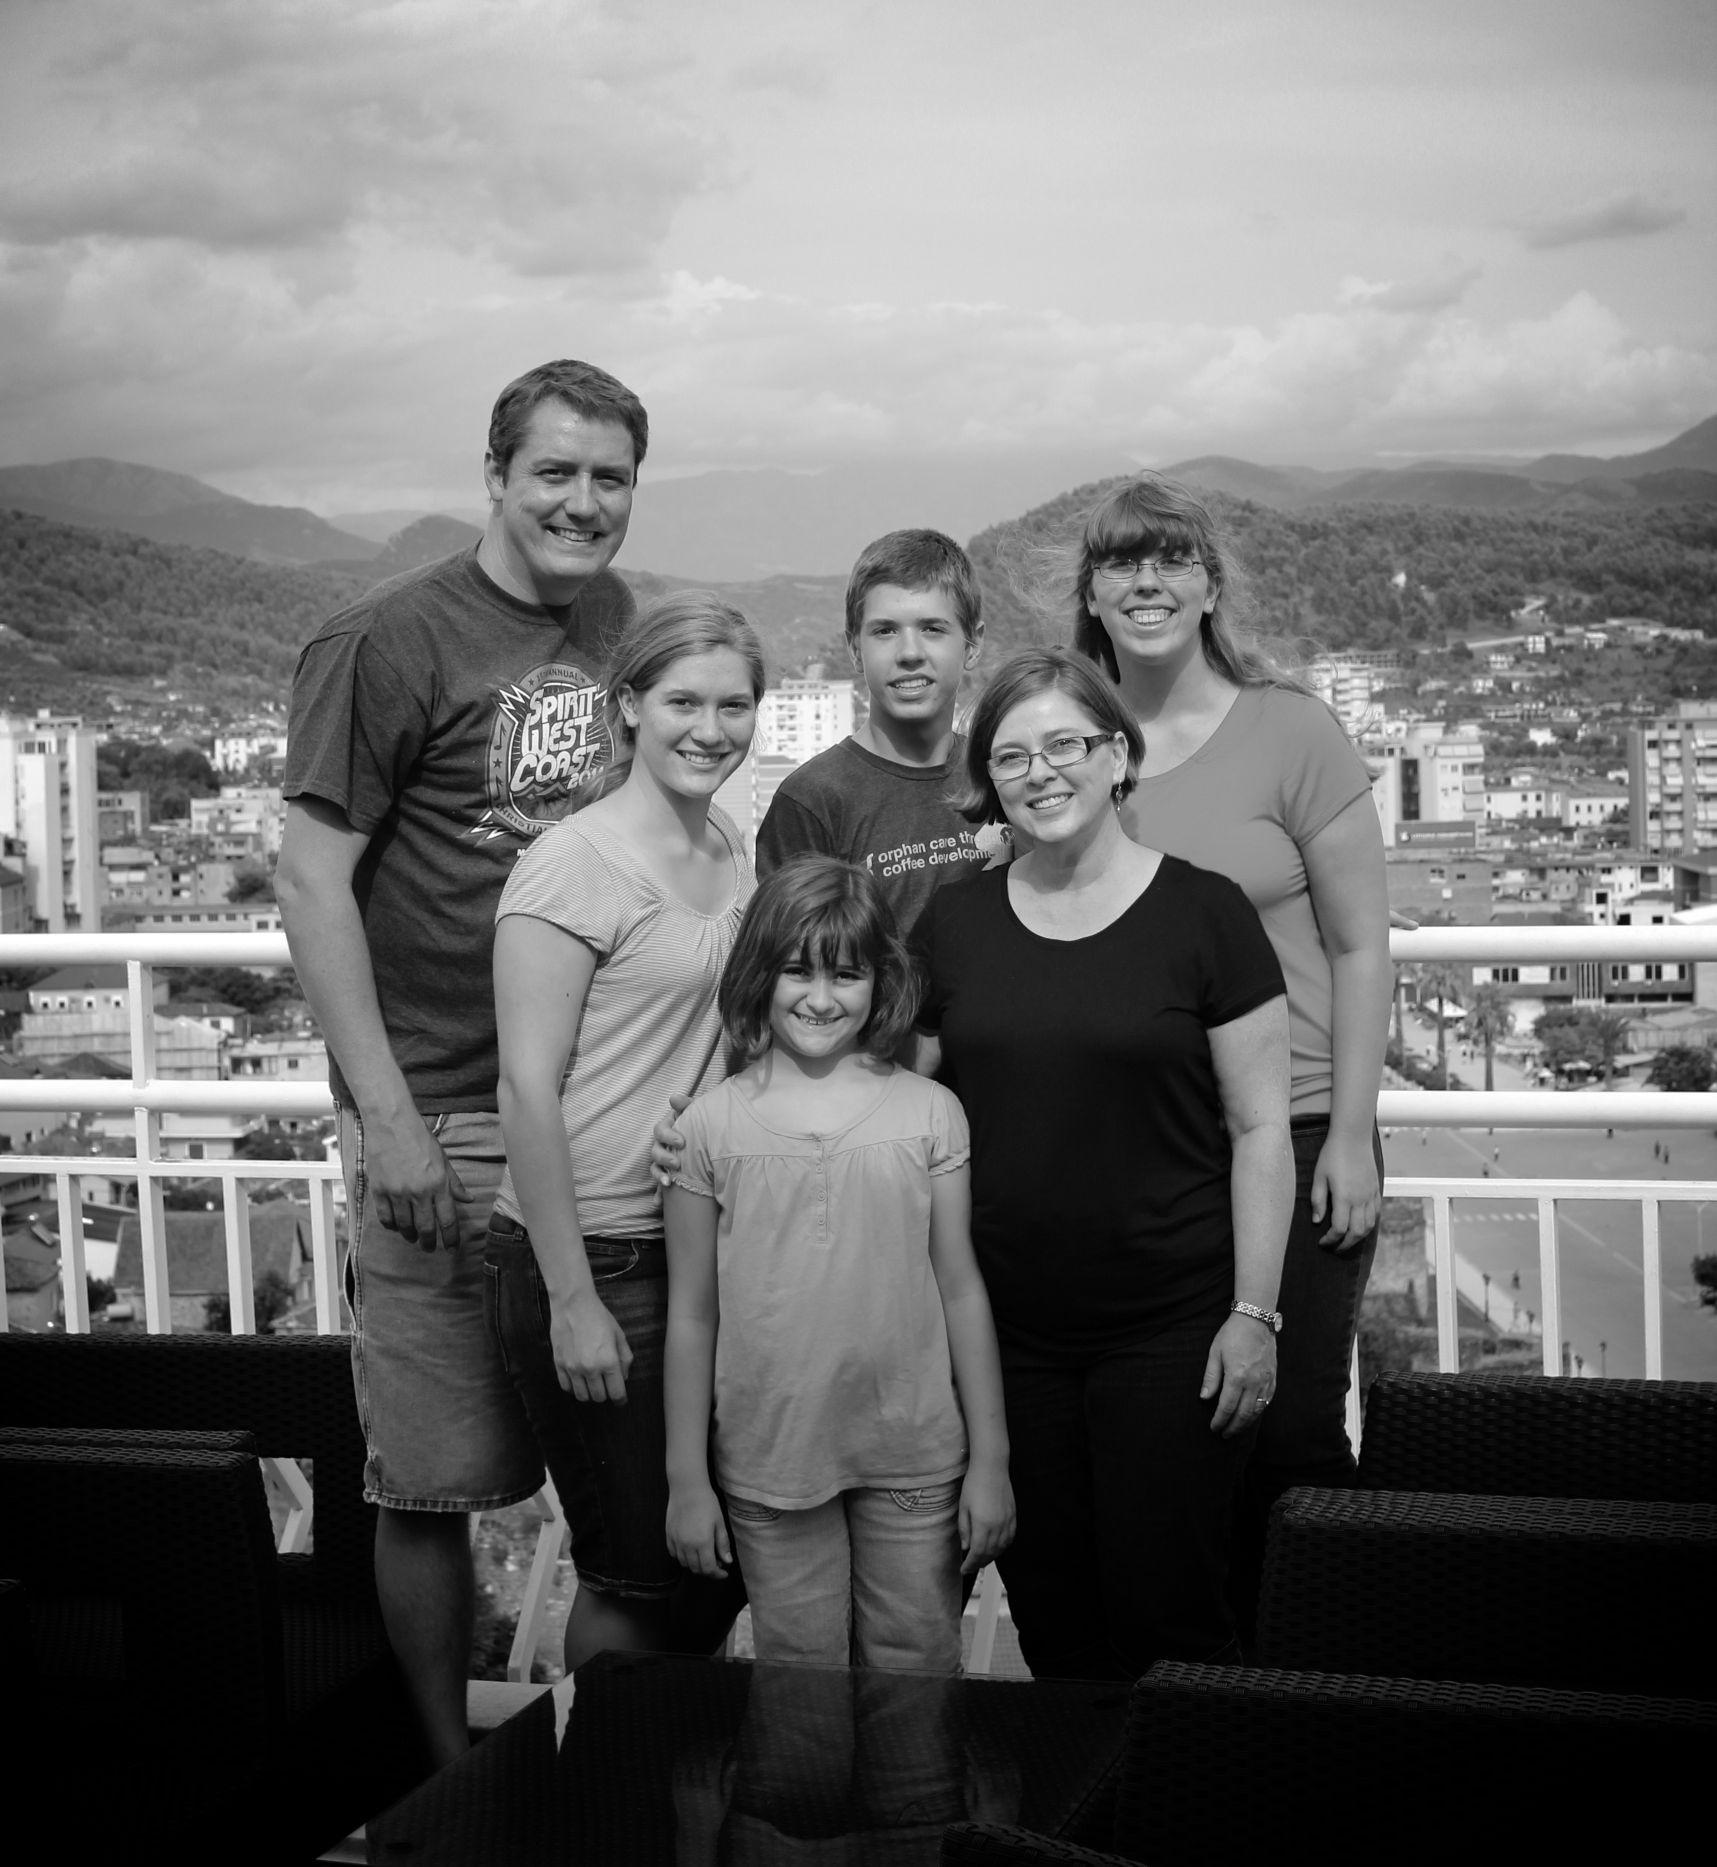 Ken, Tanja, Shelby, Bethany, Robbie and Jillian Shackelford - overlooking Elbasan.